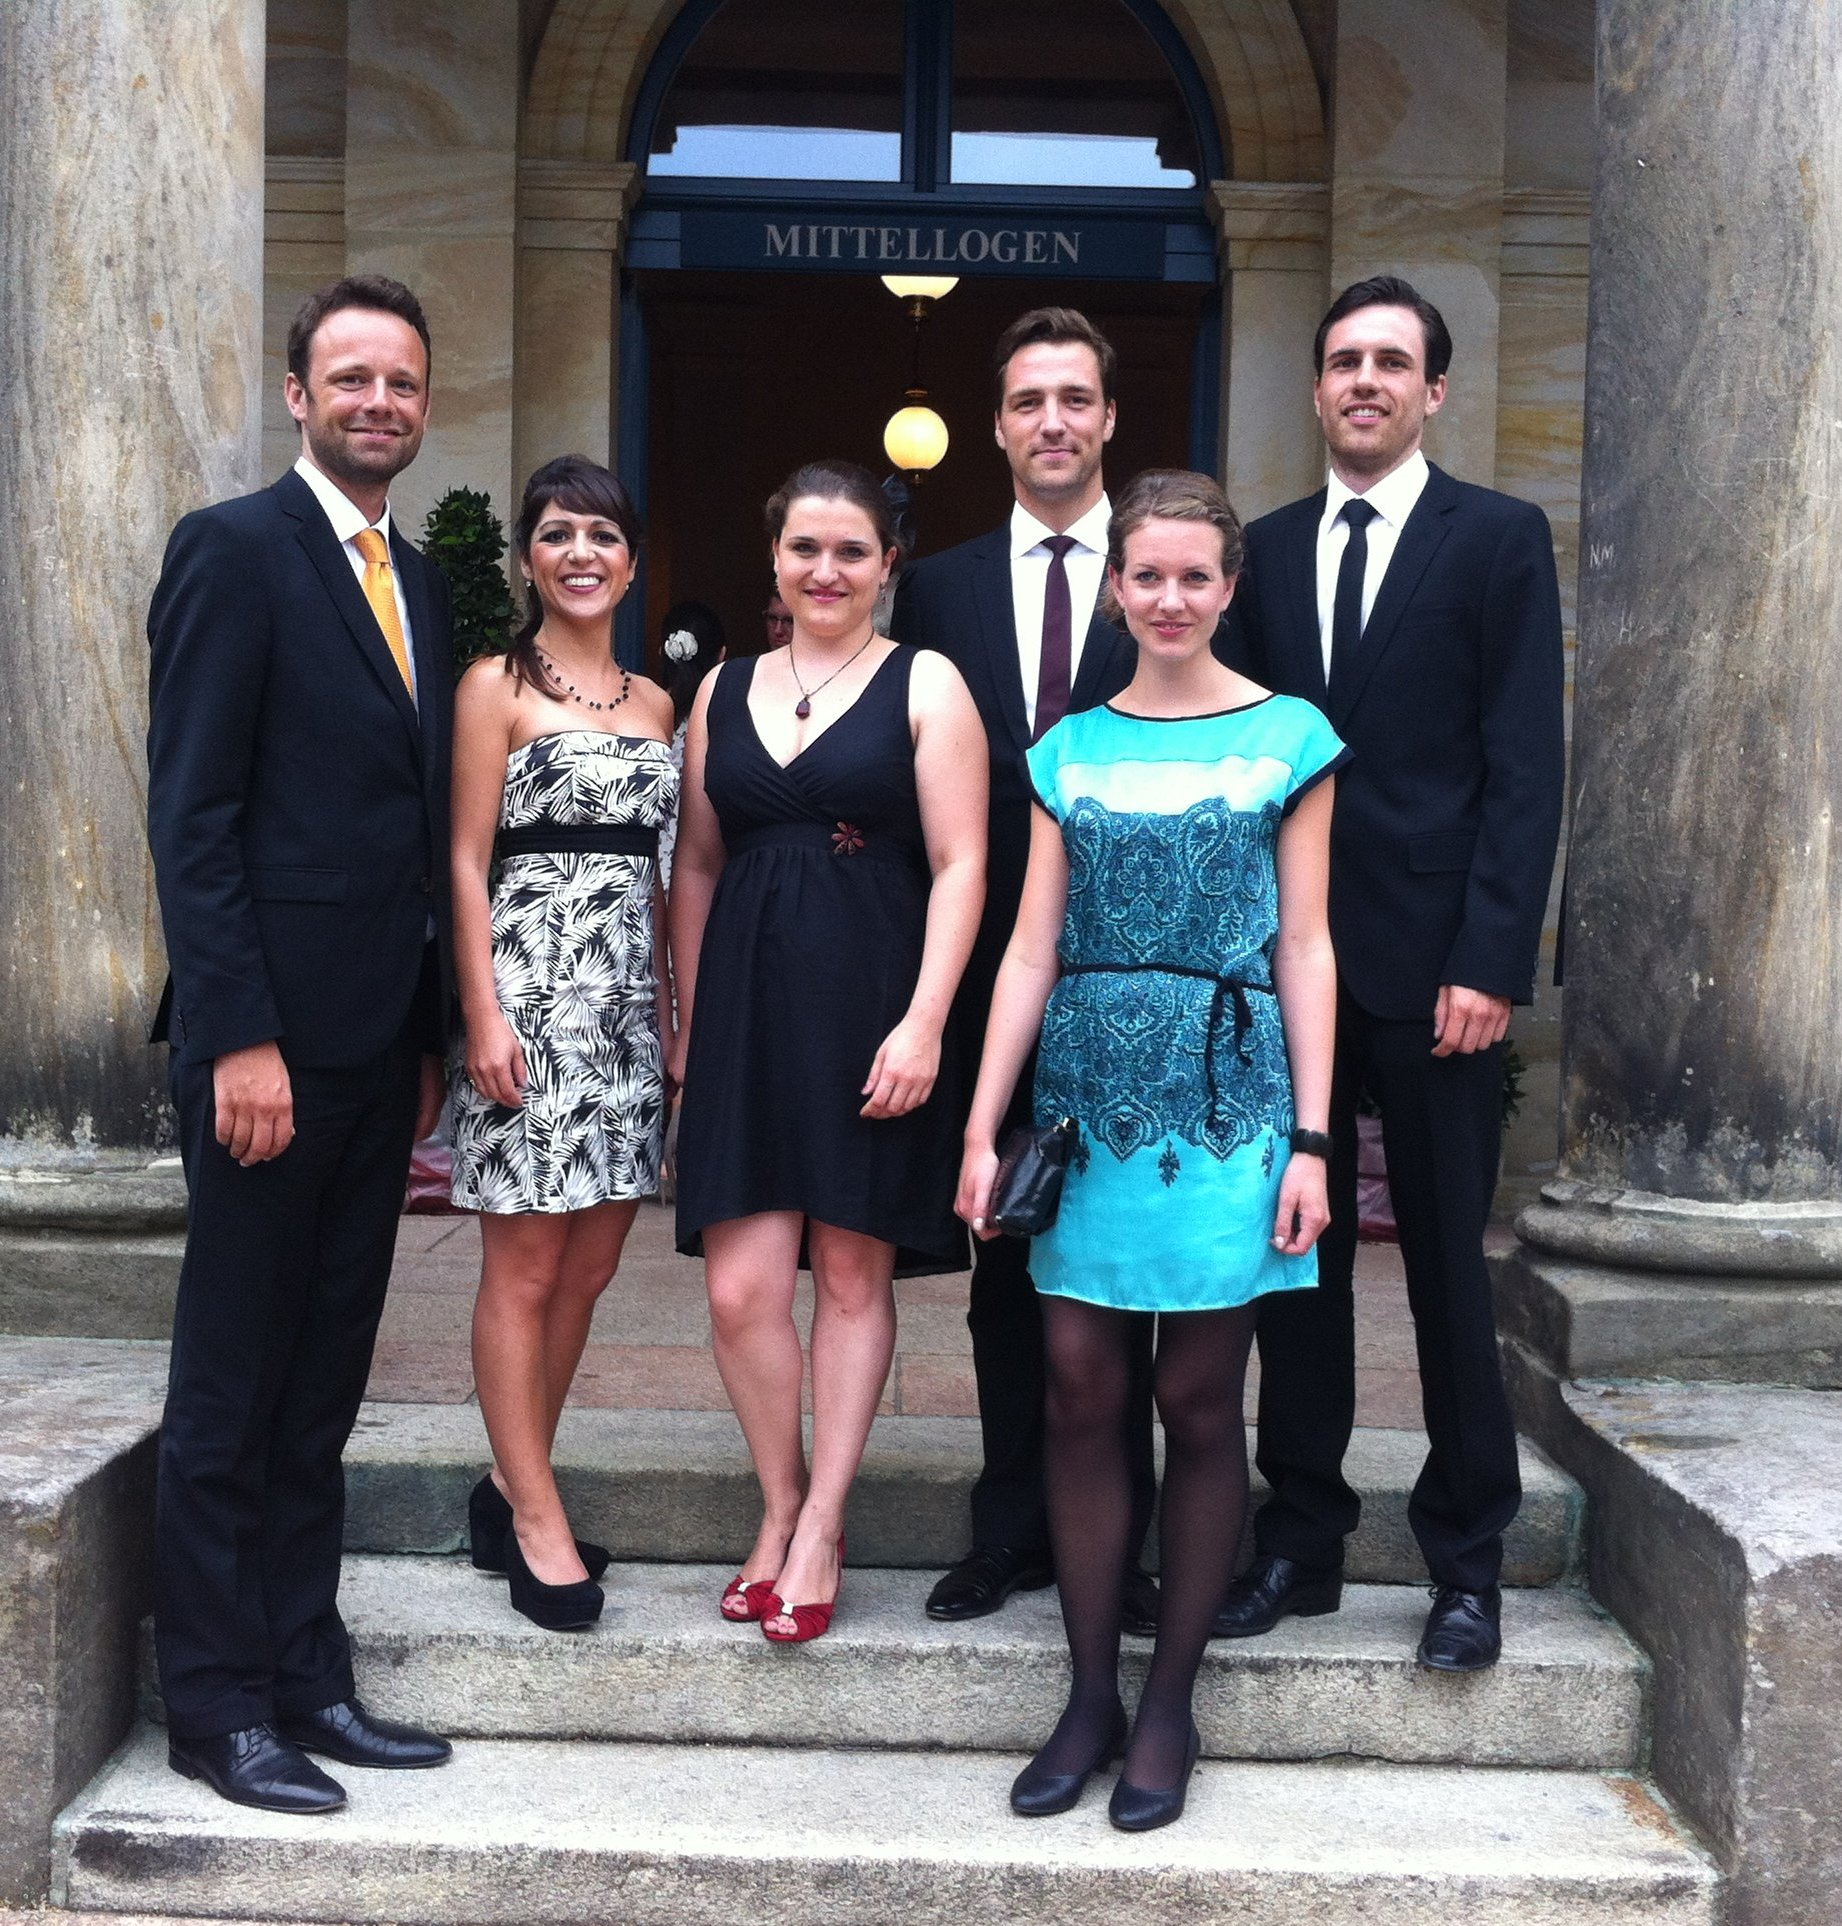 Von links nach rechts: Lucas Singer, Vivian Guerra, Sofia Pavone, Christian Henneberg, Sarah Schnier, Jan-Paul Reinke